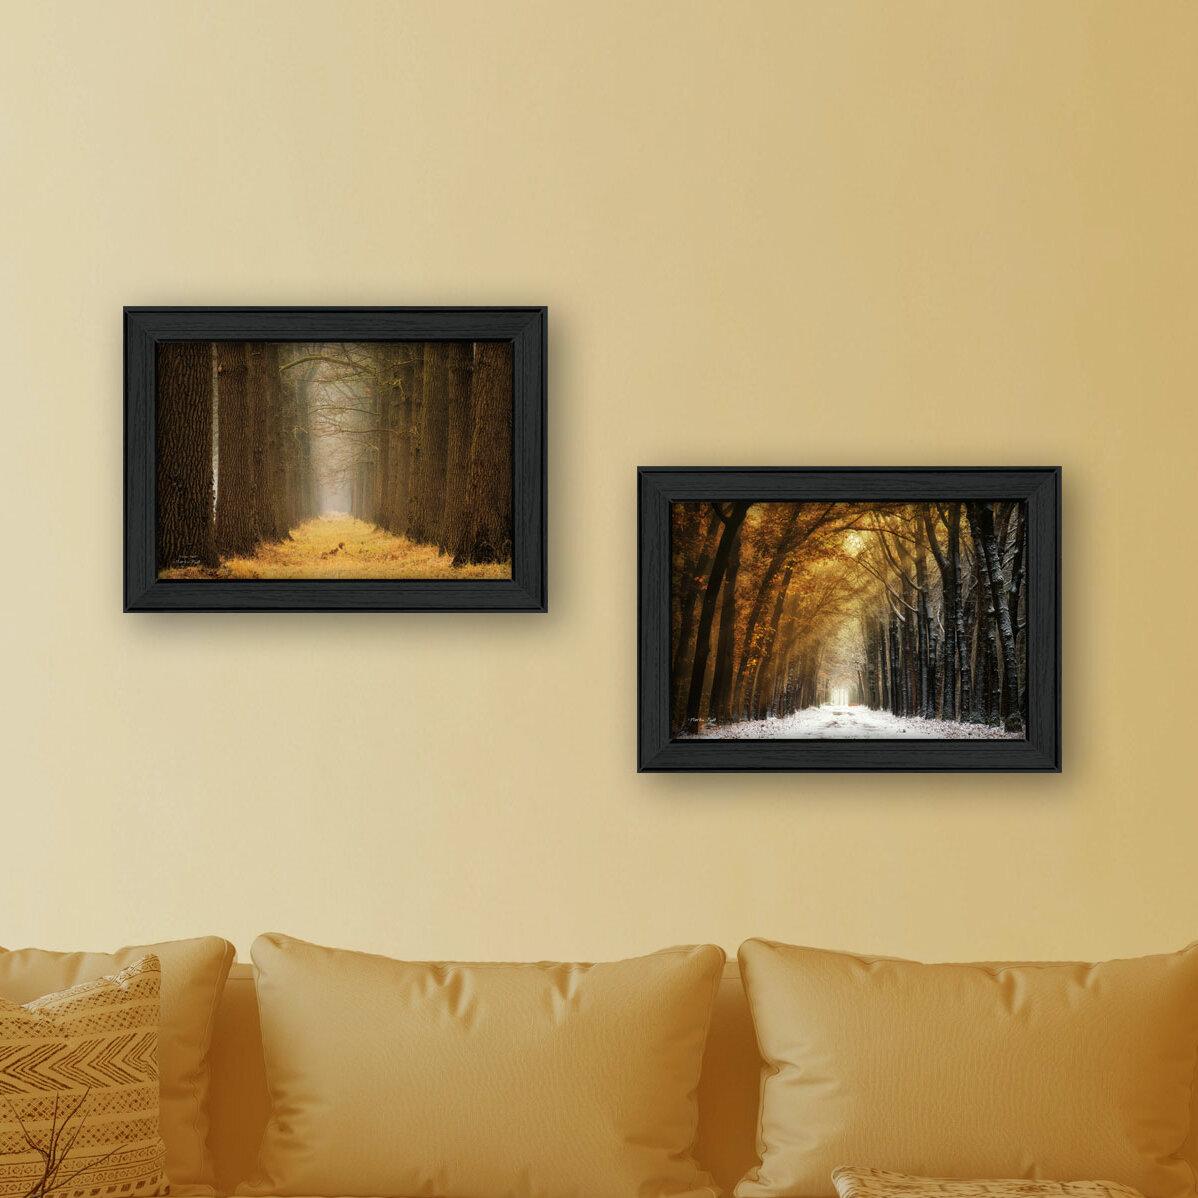 Trendy Decor 4U \'Golden Forest Path\' 2 Piece Framed Graphic Art ...